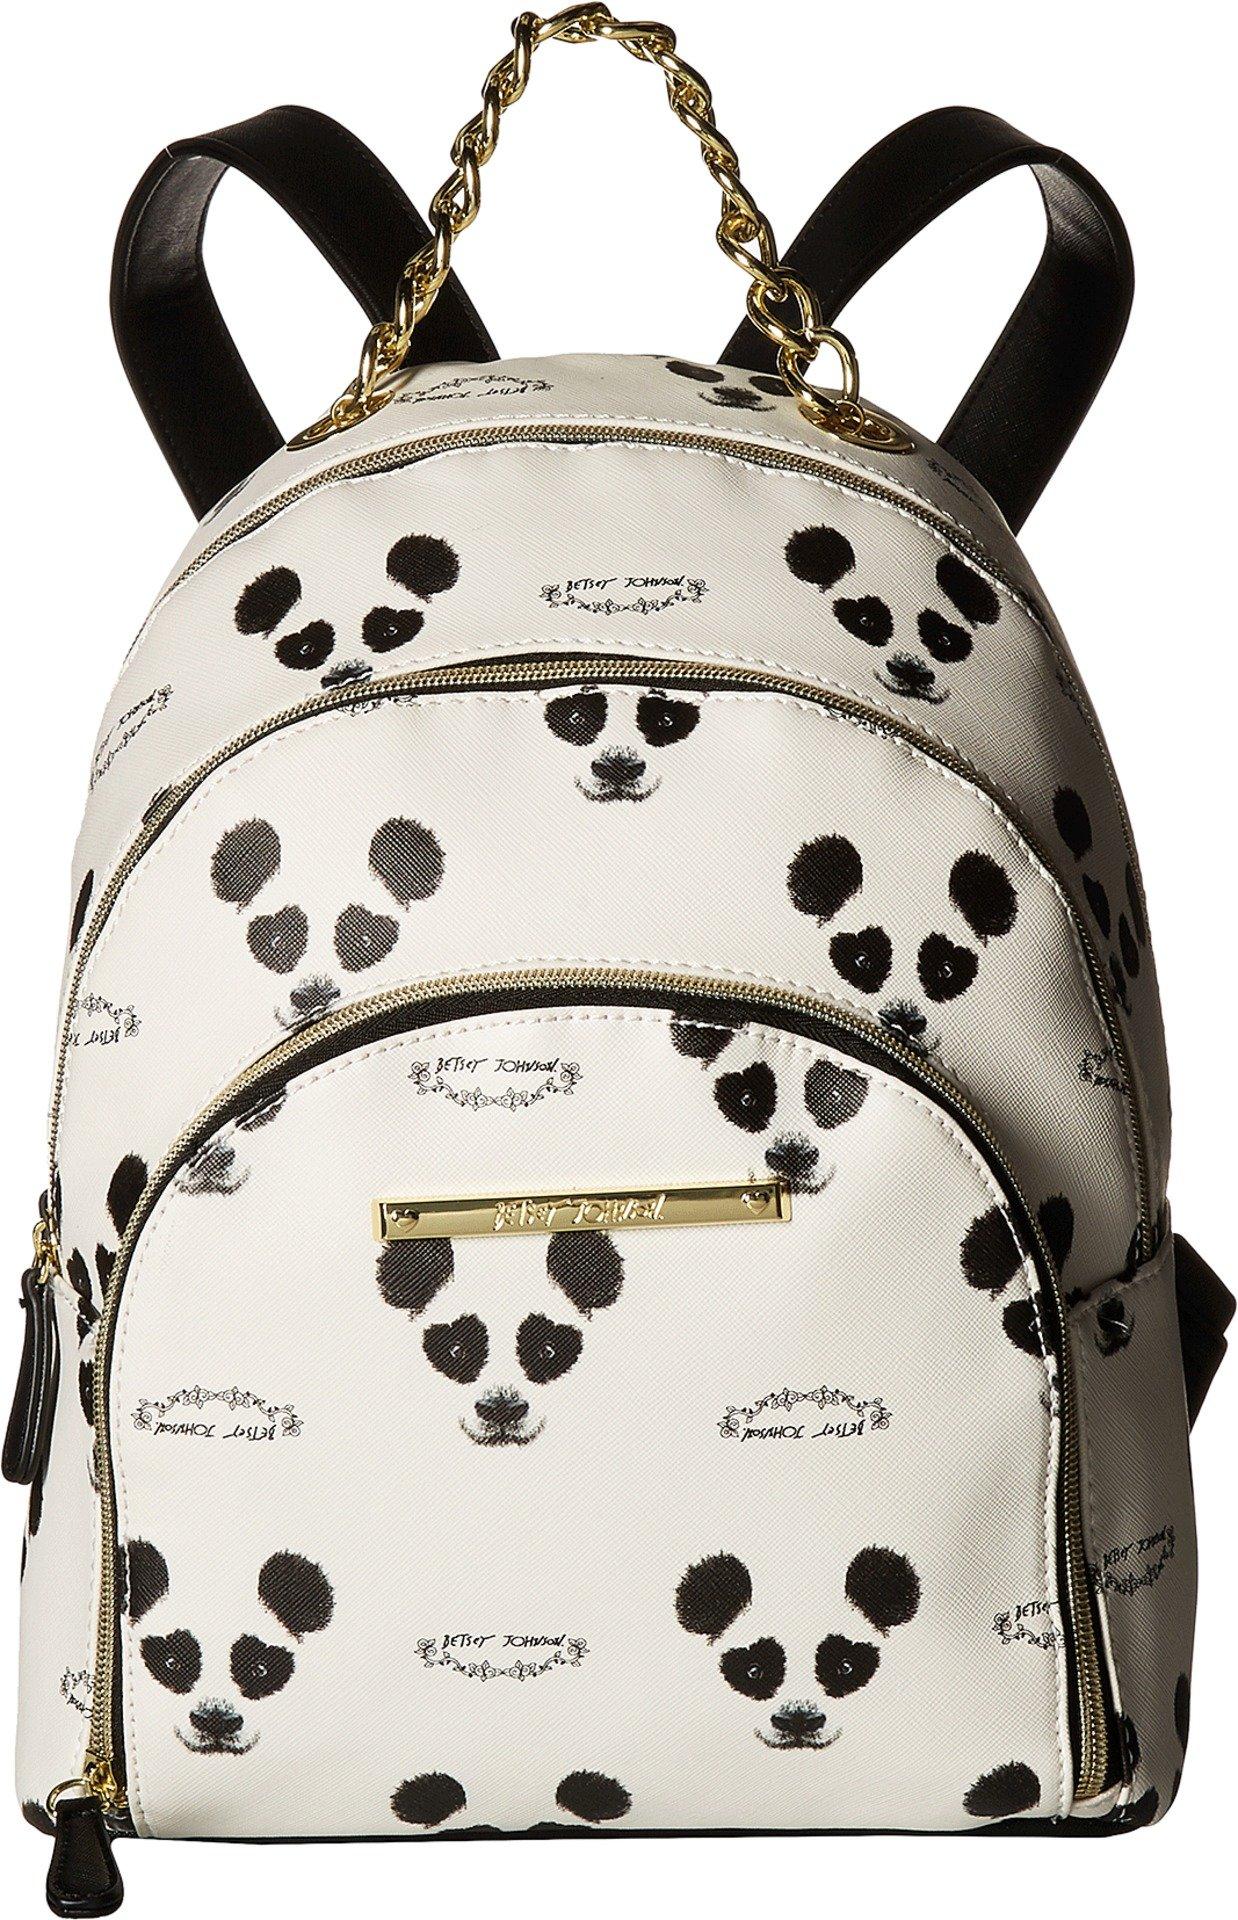 Betsey Johnson Women's Triple Zip Backpack Cream/Black One Size